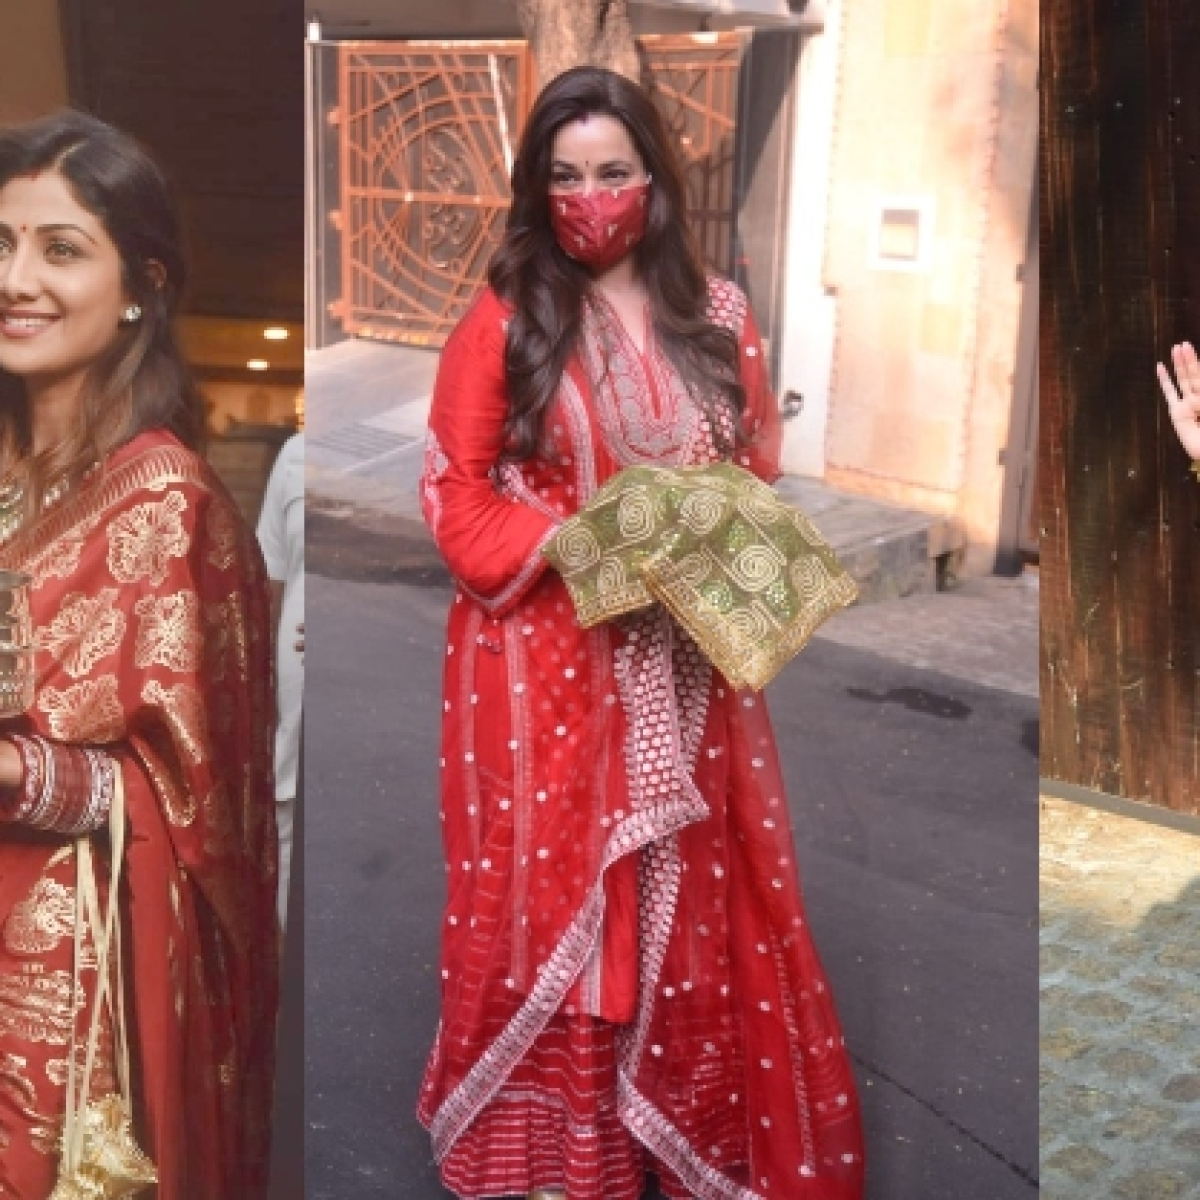 In Pics: Shilpa Shetty Kundra, Natasha Dalal and others attend Anil Kapoor's wife Sunita's Karva Chauth celebrations